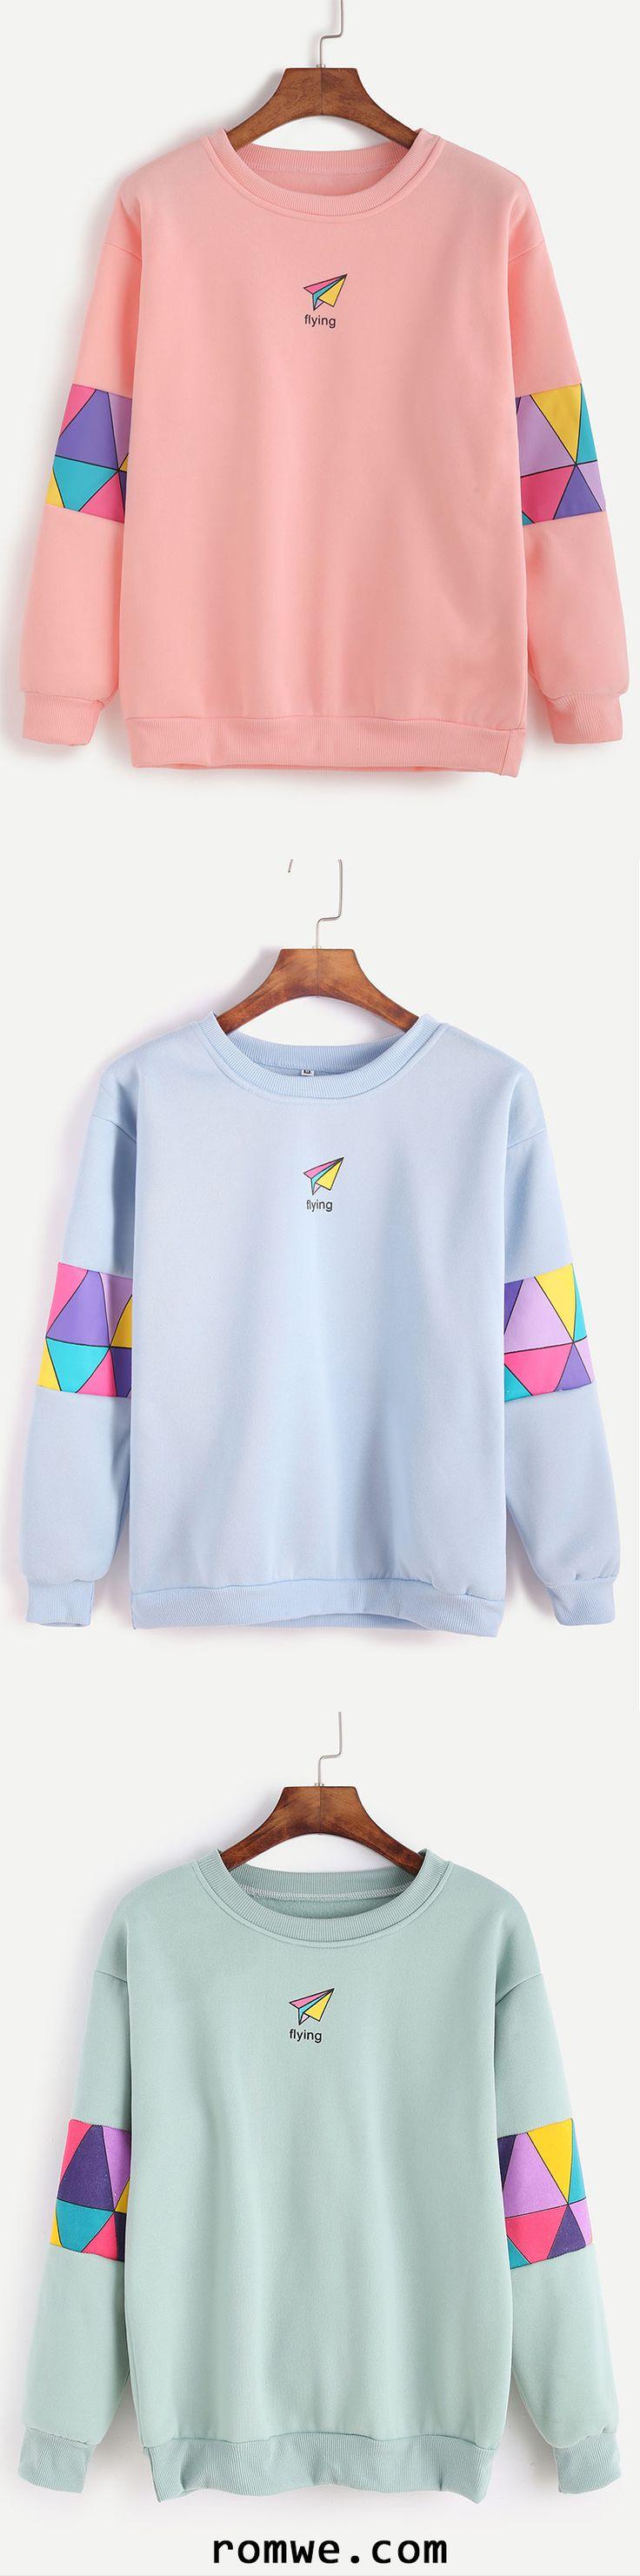 Patchwork Print Sweatshirt